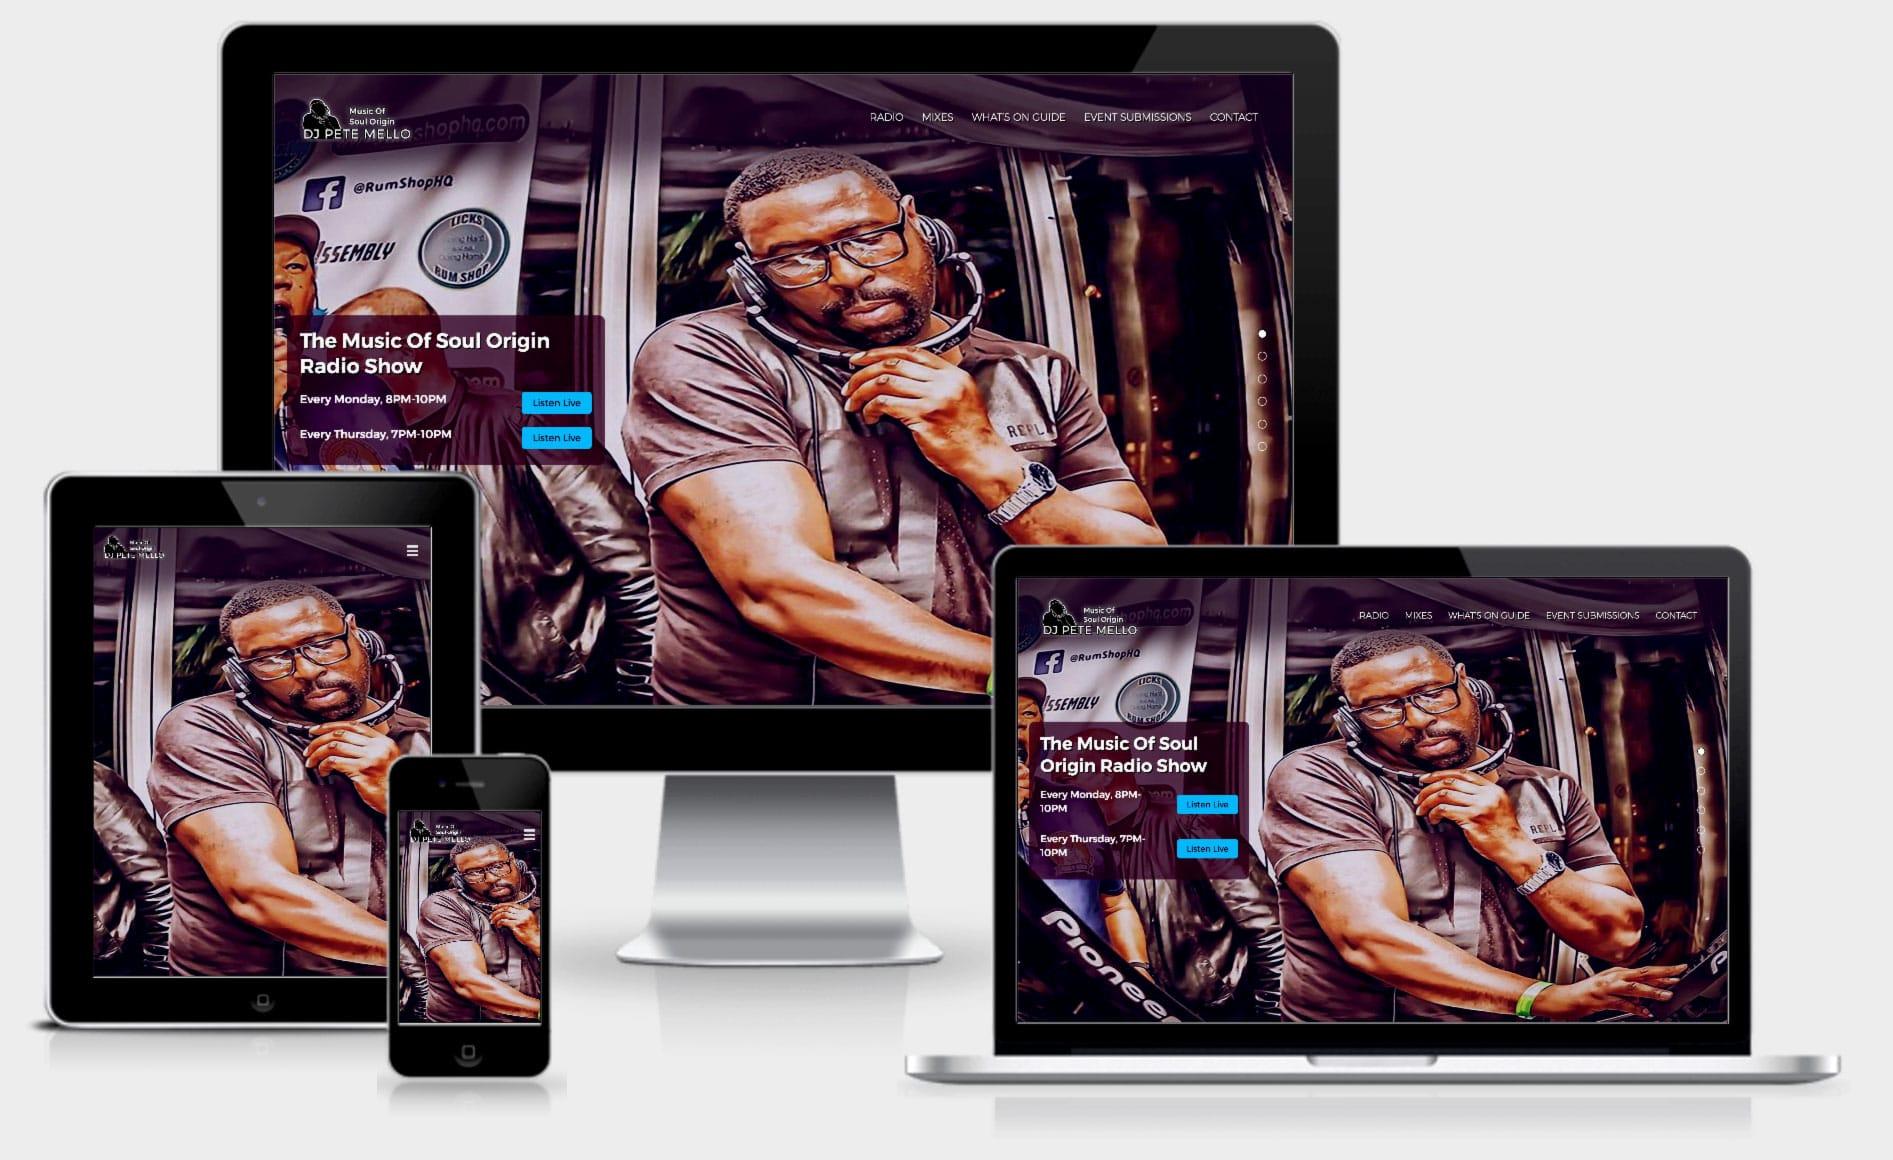 dj-pete-mello-mpower-webdesign-template